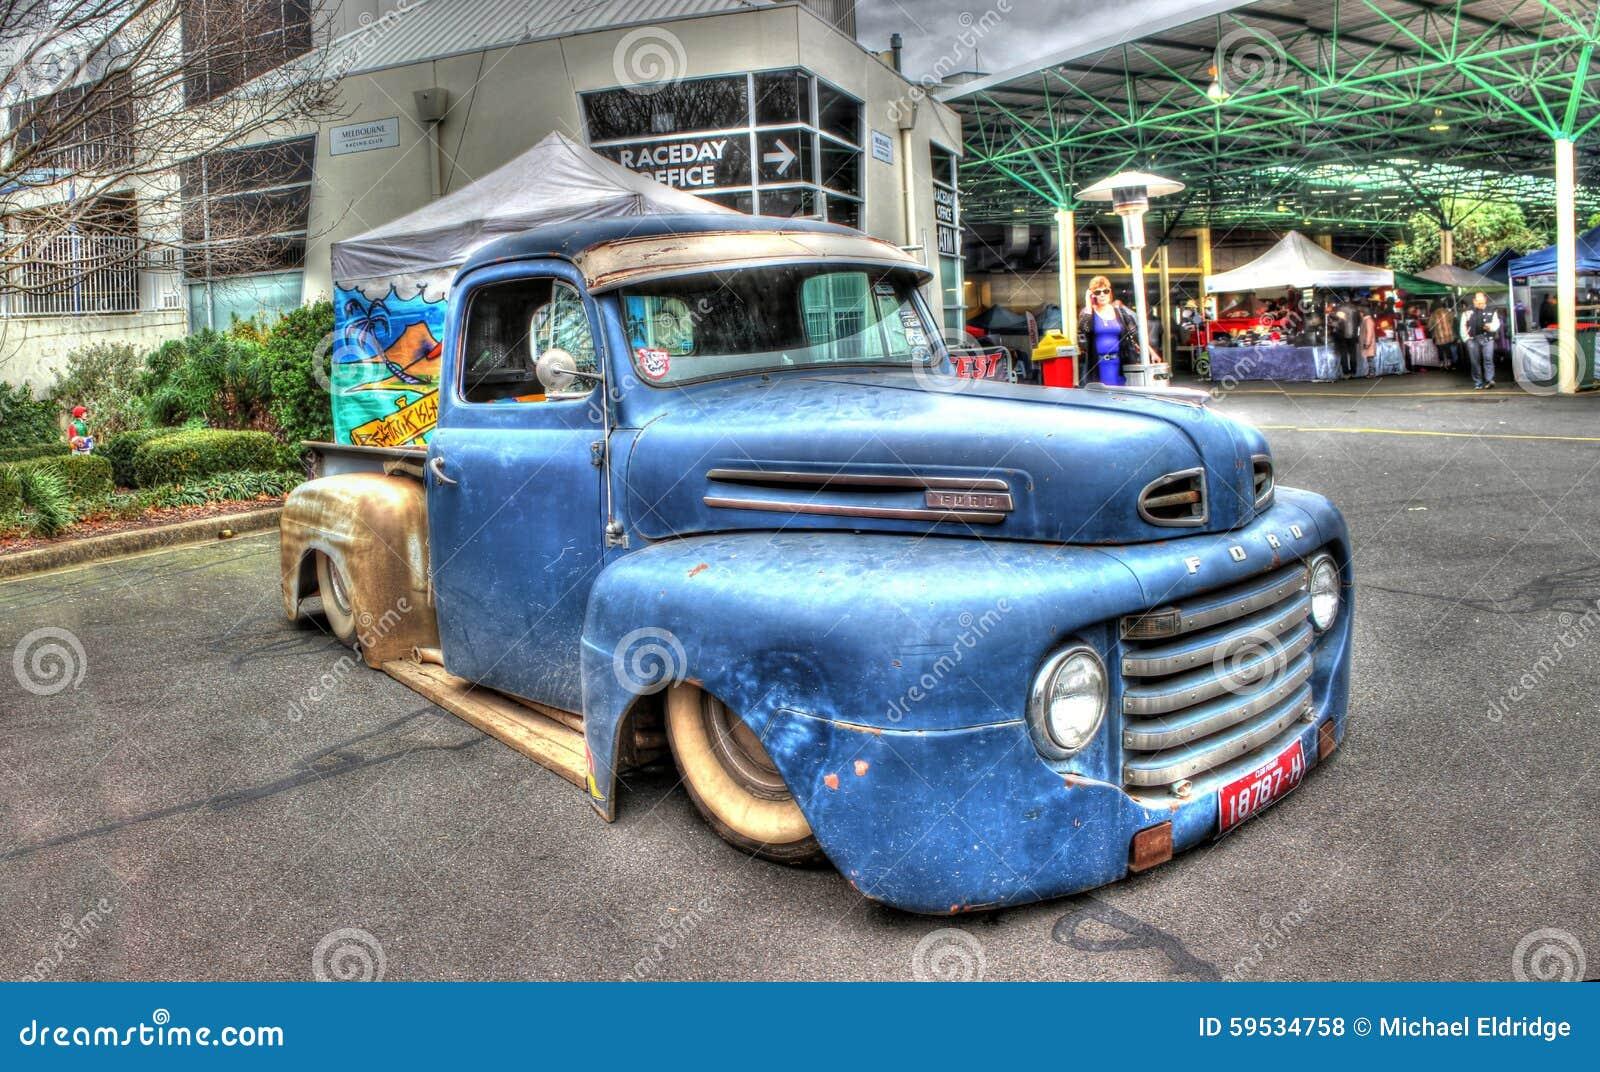 Classic Cars Forgotten On Farm